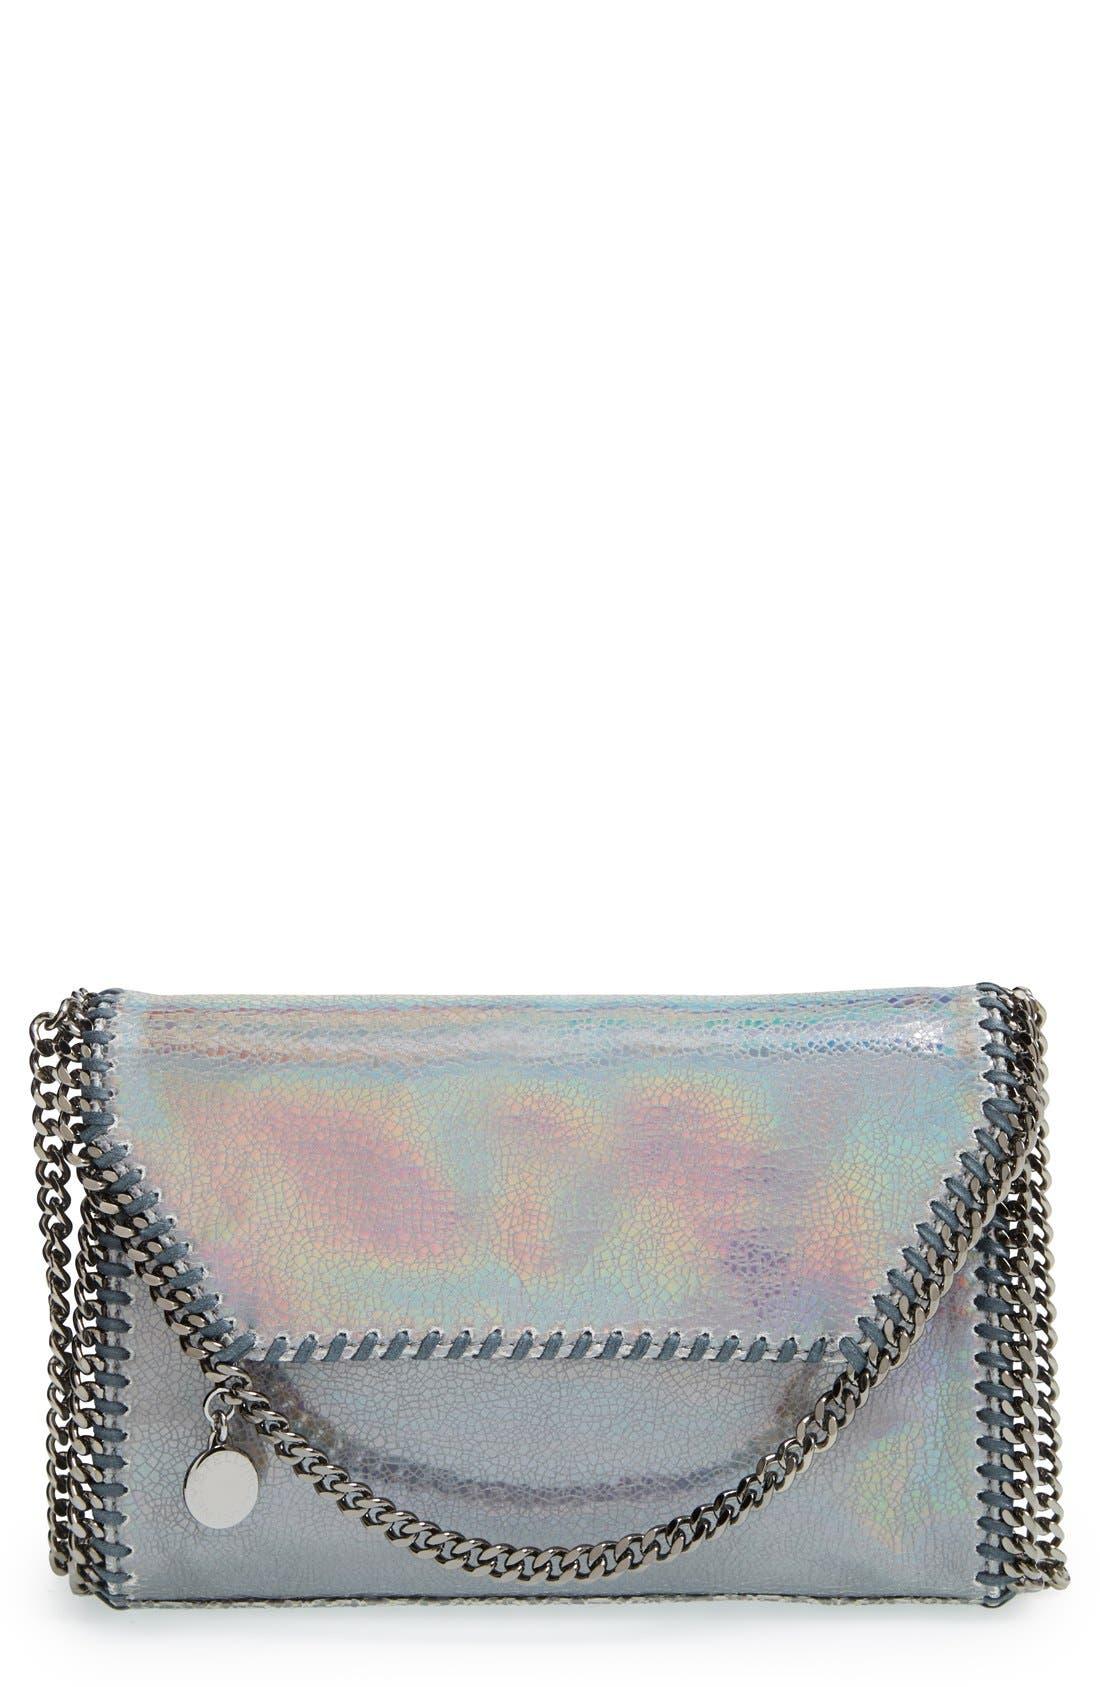 Main Image - Stella McCartney 'Mini Falabella - Hologram' Crossbody Bag